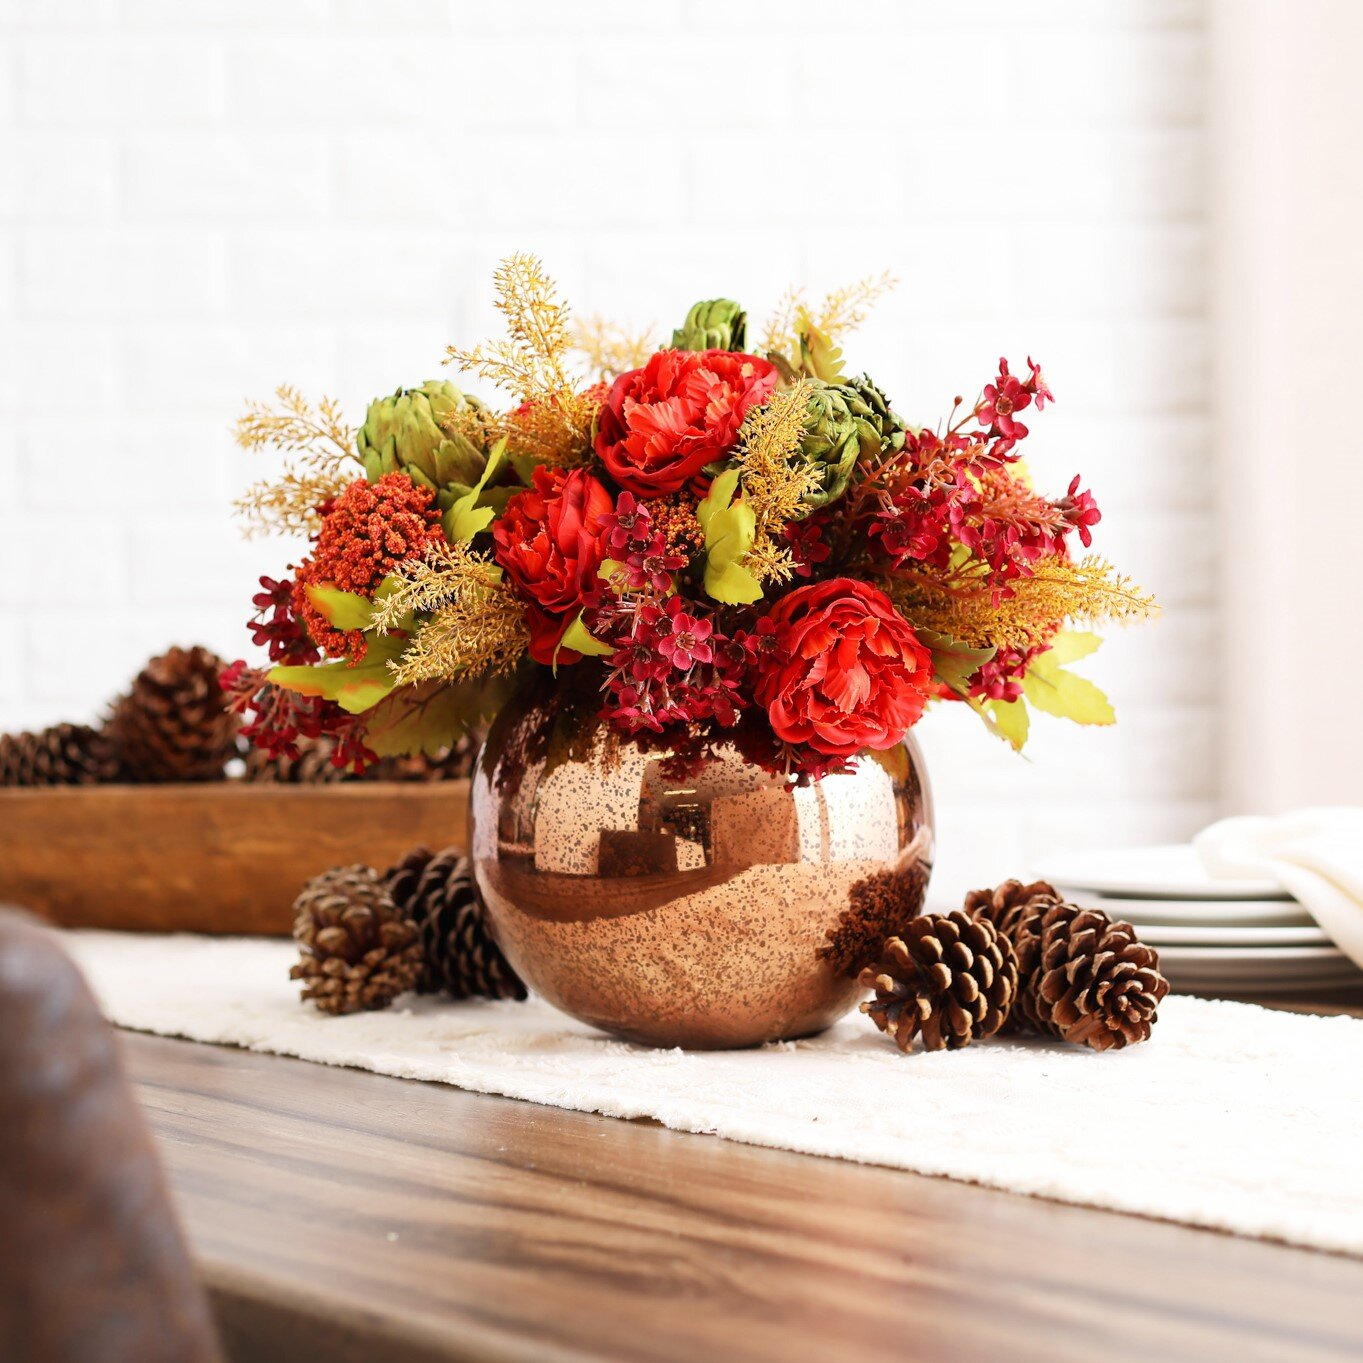 Darbycreektrading Paprika Ranunculus Dried Artichoke Rust Wildflower Fall Floral Arrangement Centerpiece In Bronze Glass Vase Wayfair